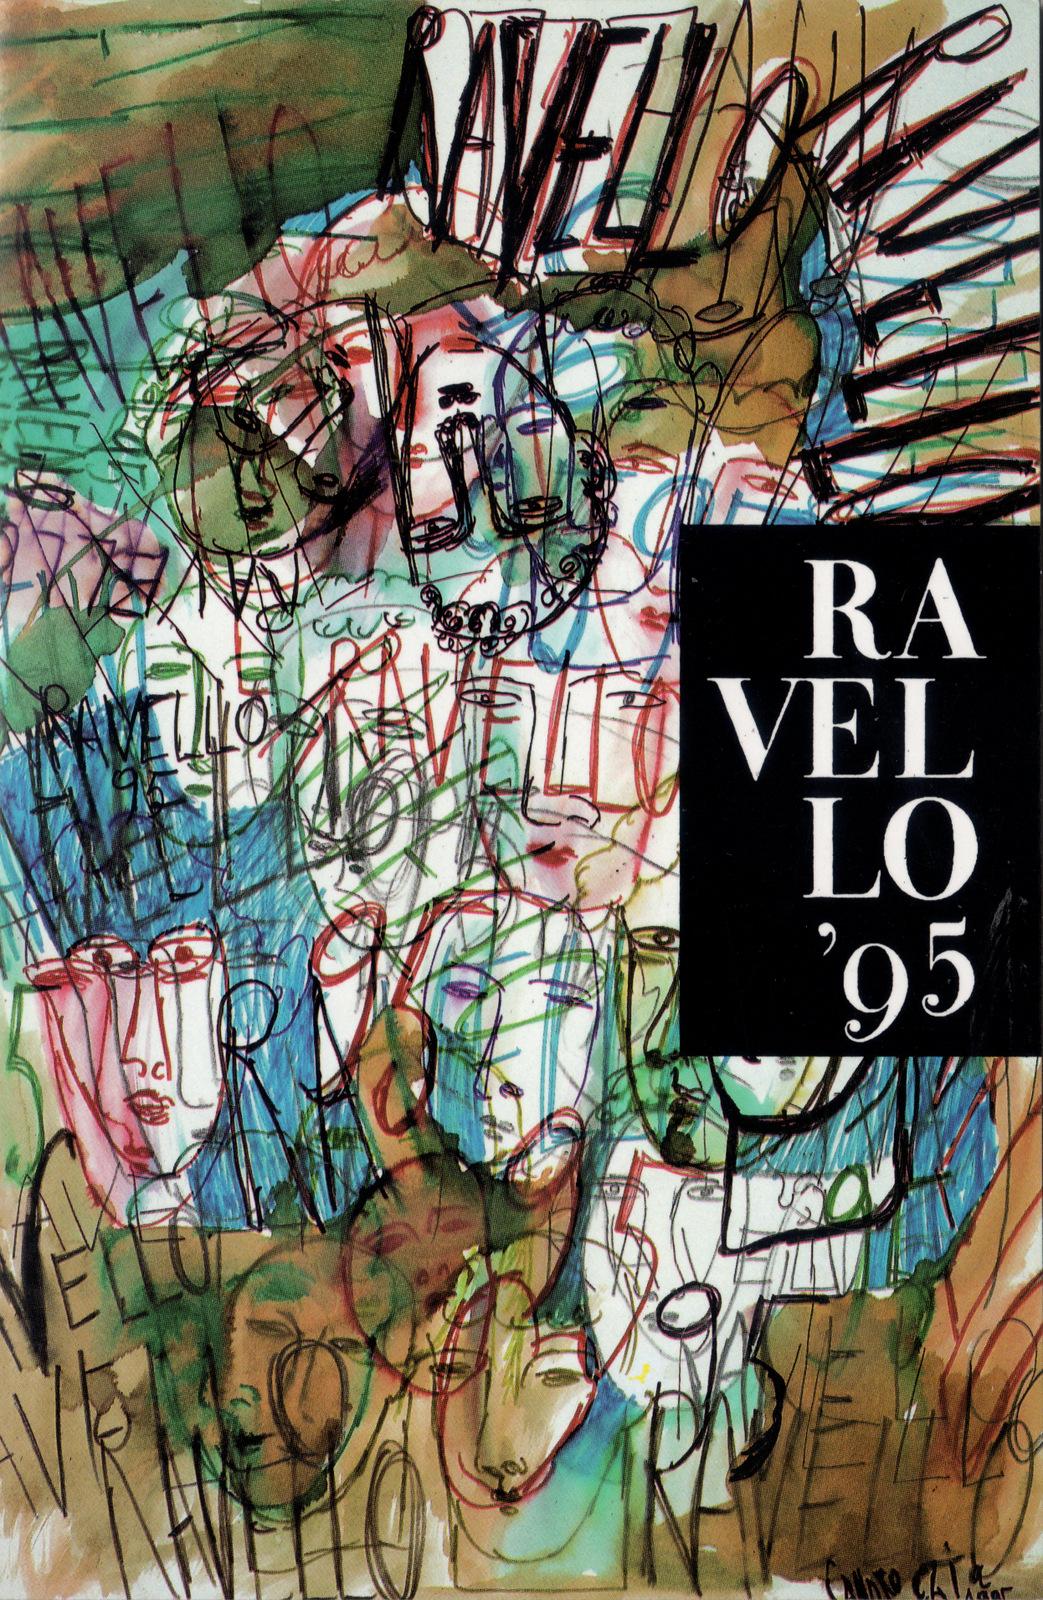 Manifesto Ravello 1995